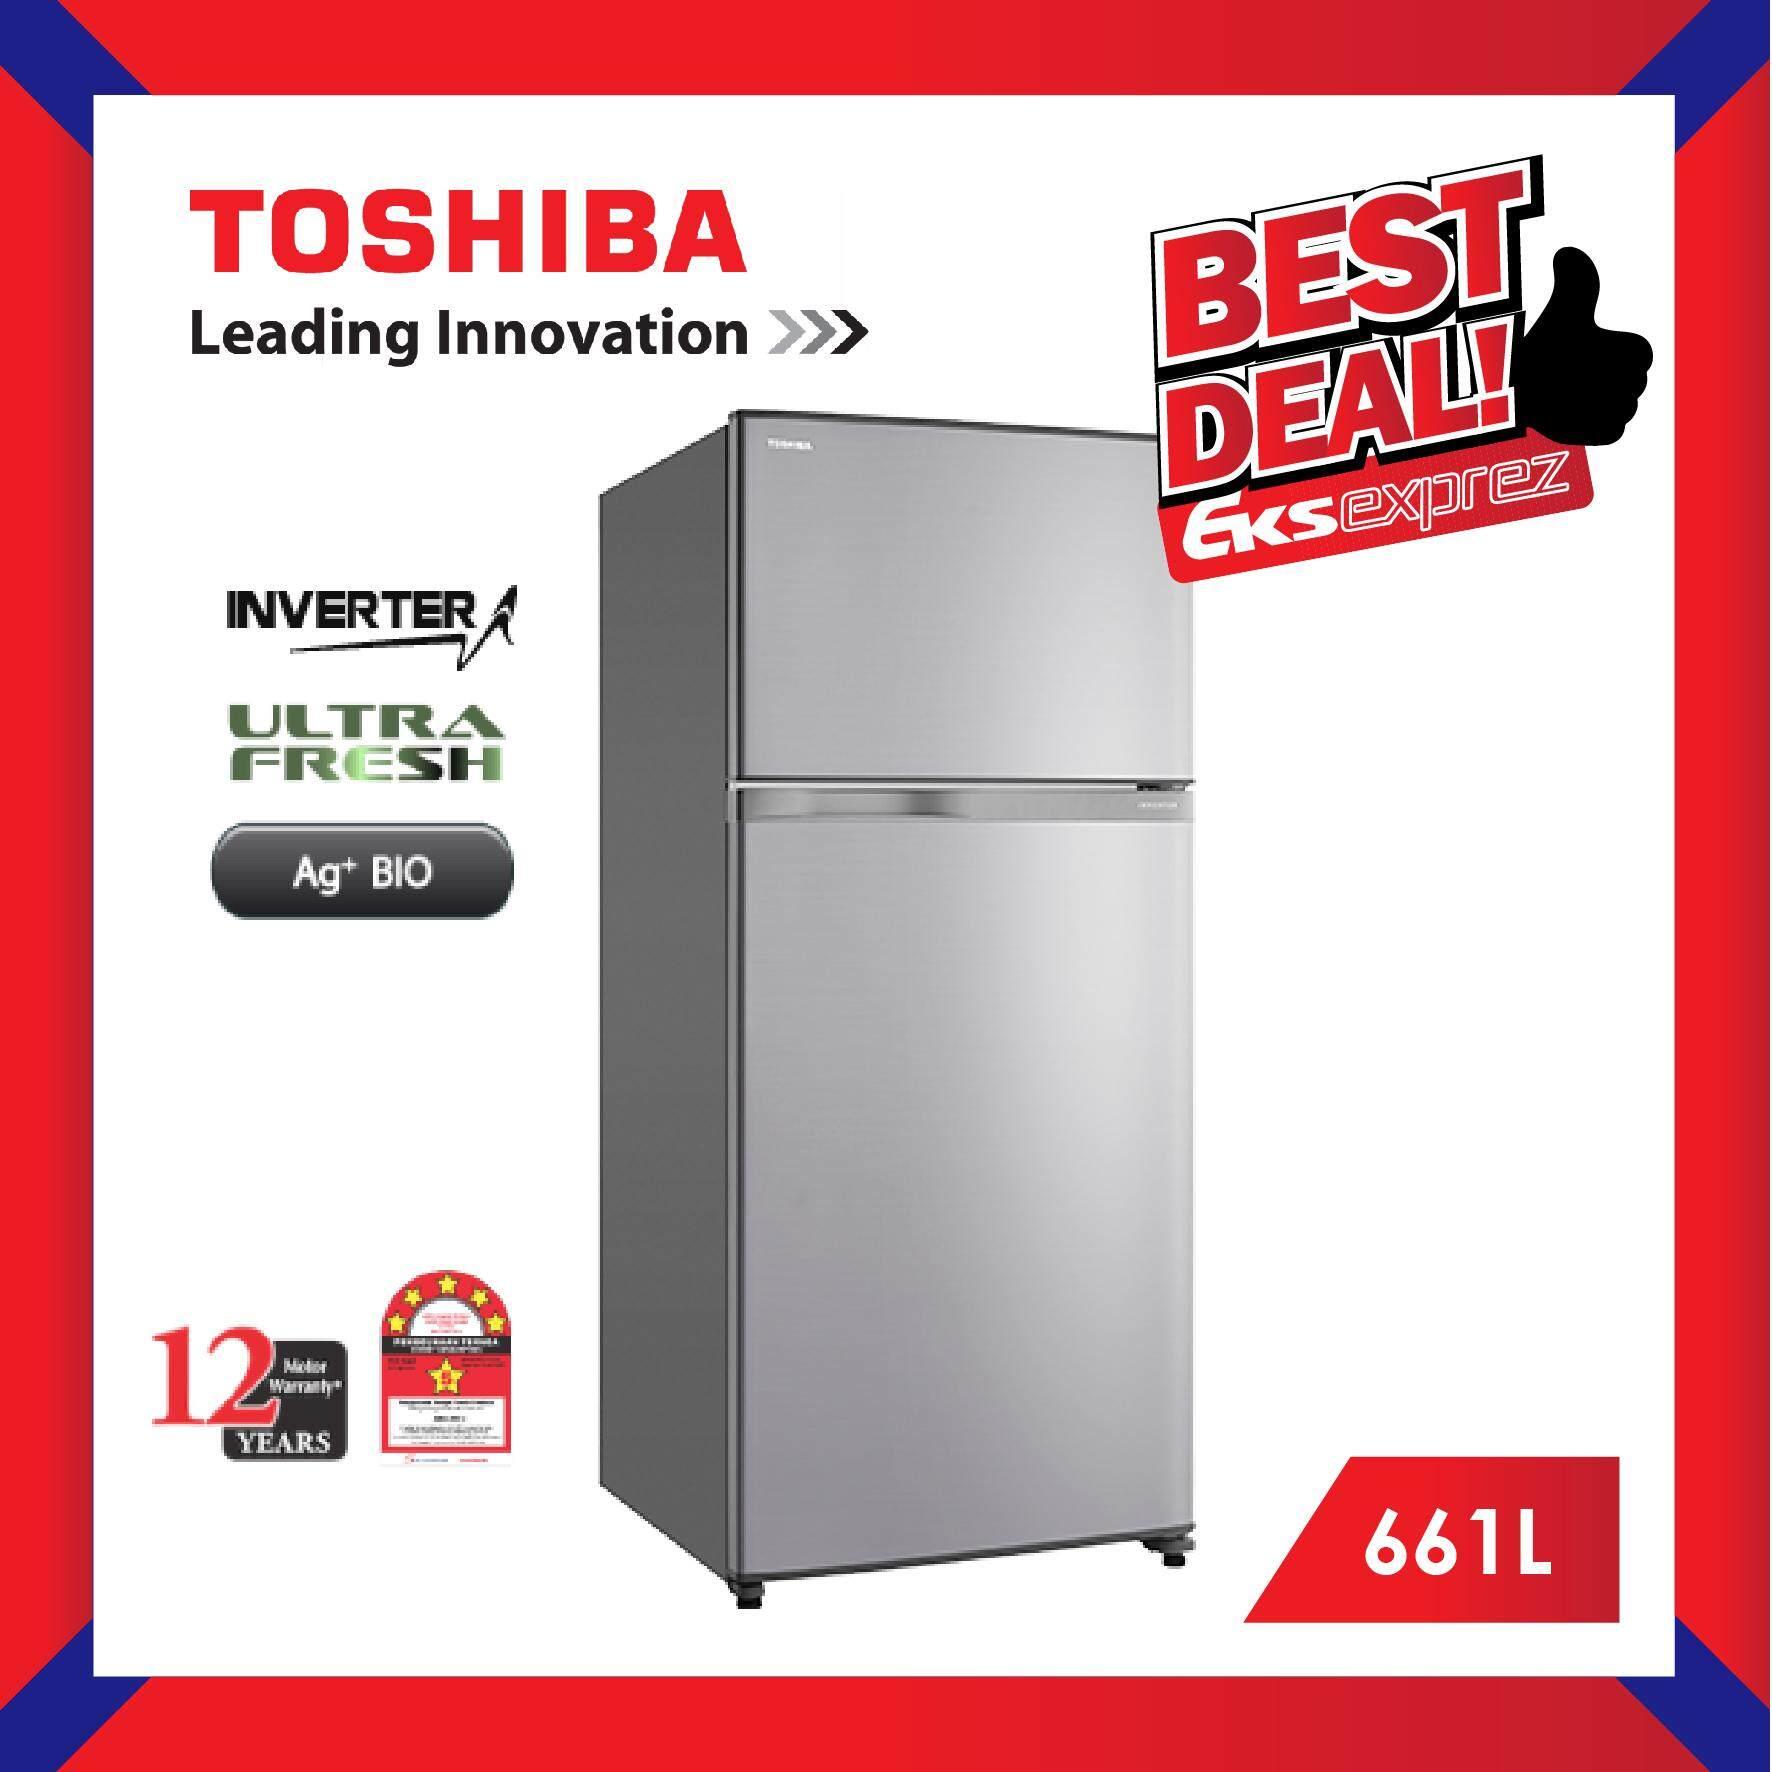 Toshiba GR-A66M (S) 661L 2-Doors Inverter Fridge / Refrigerator